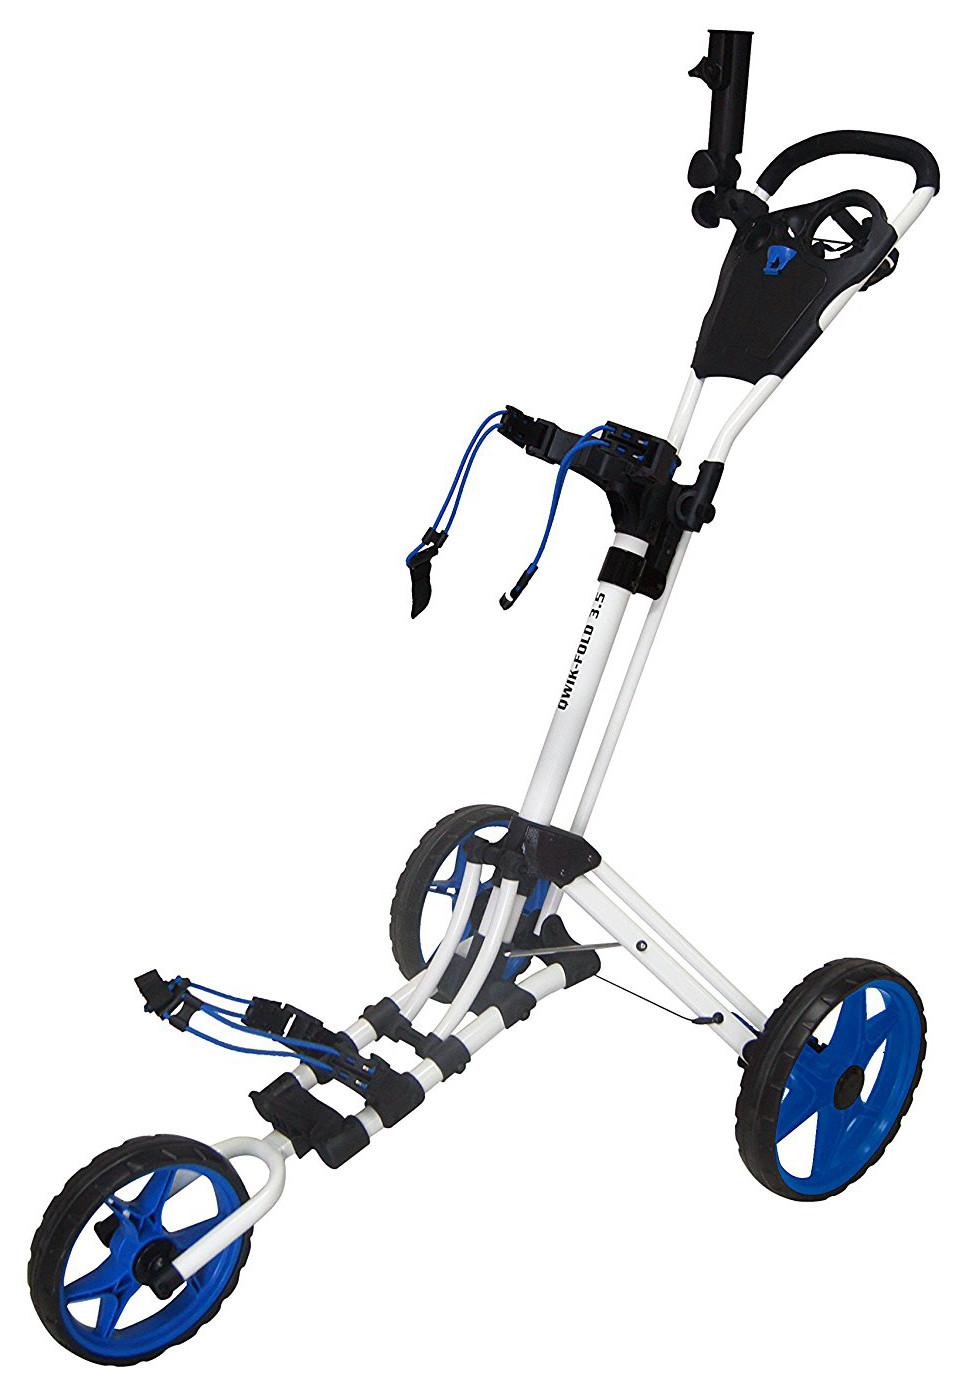 Founders Club 2016 Qwik Fold 3.5 3 Wheel Golf Push Carts